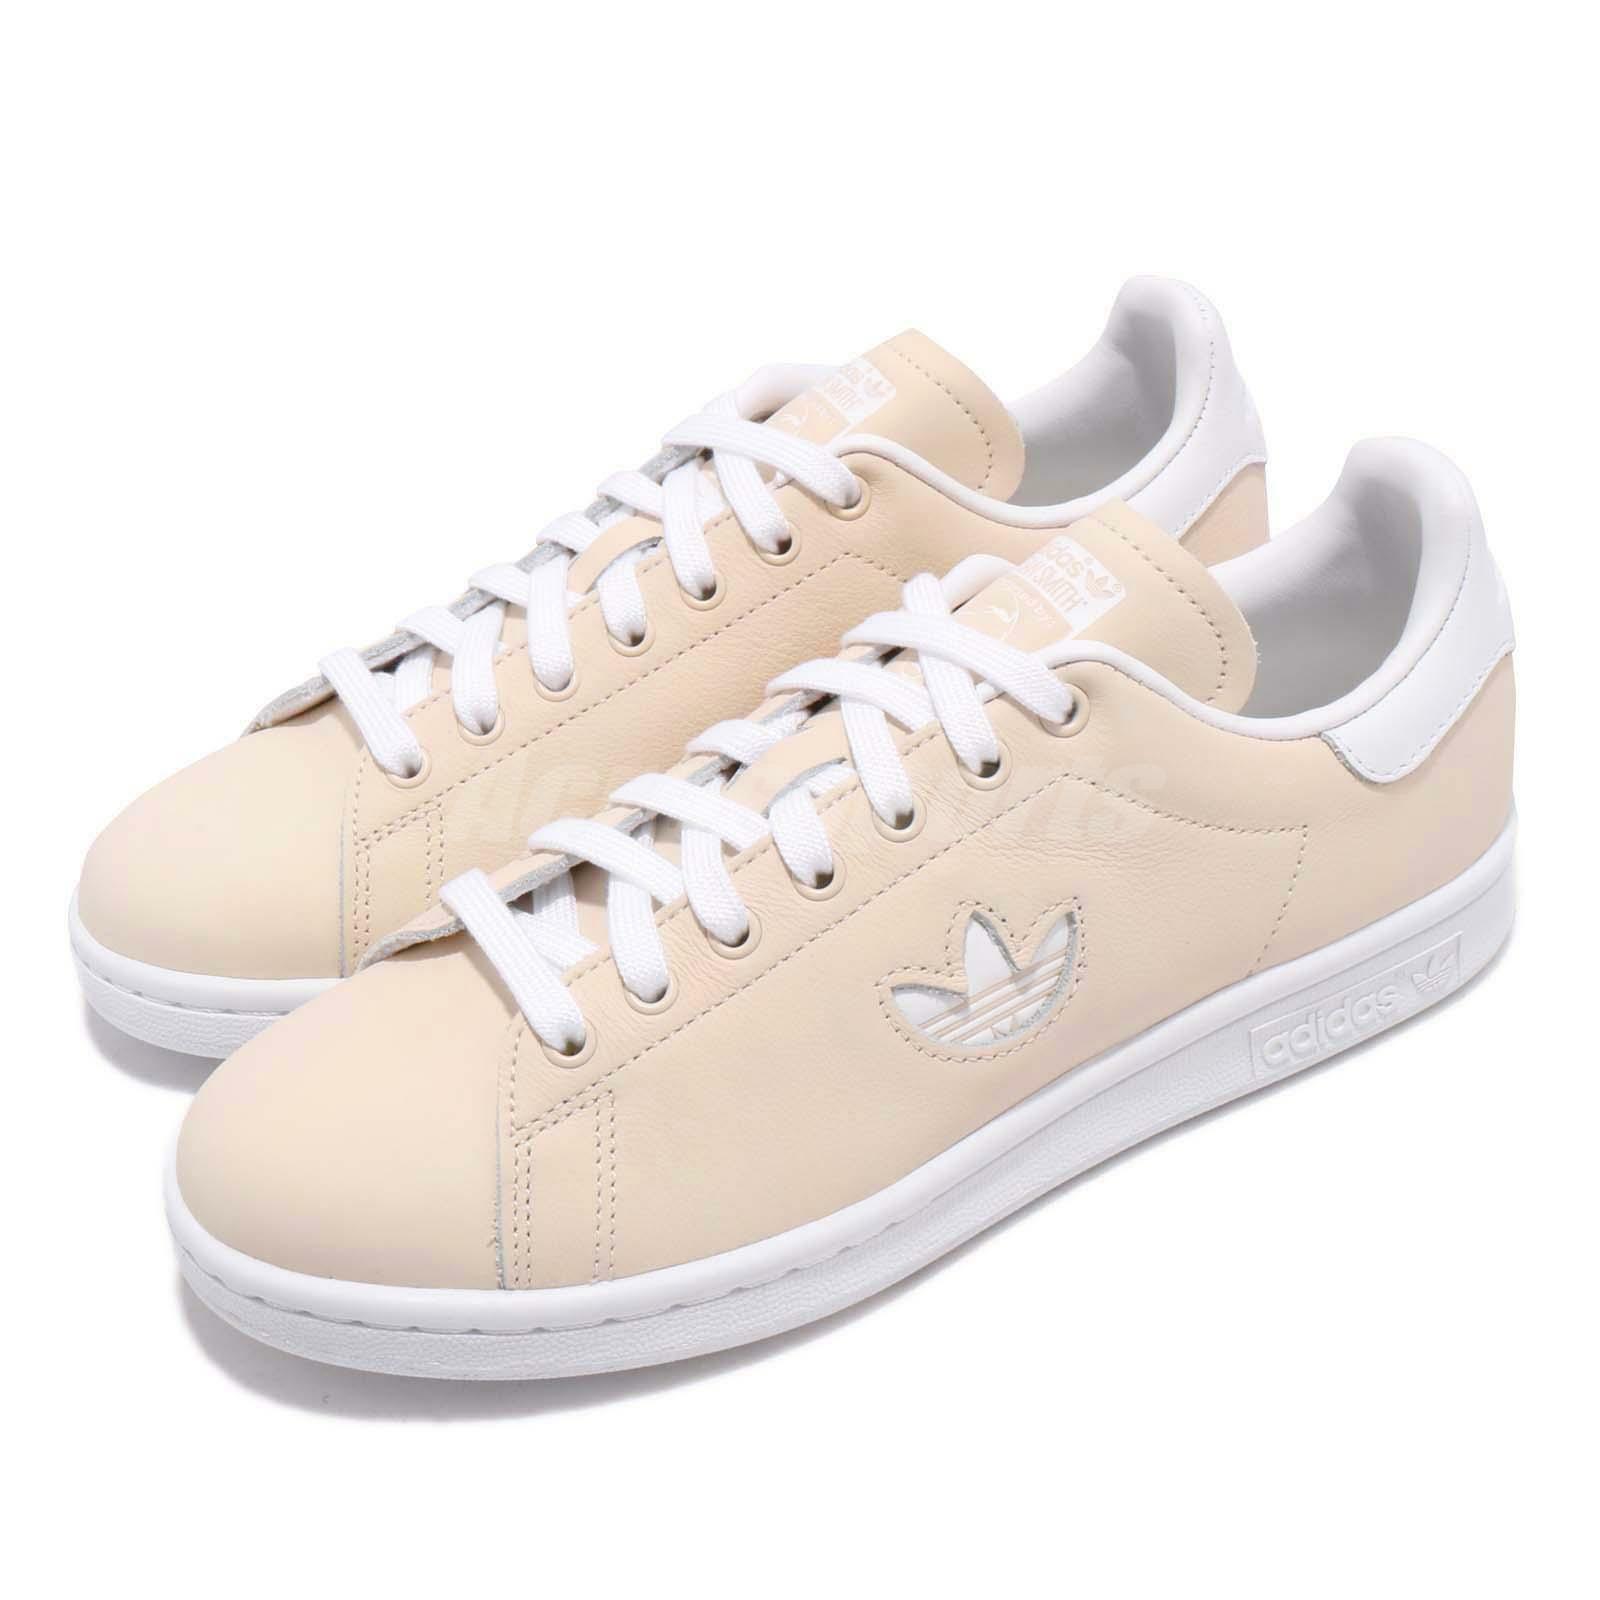 Adidas Originals Stan Smith W Beige White Women Casual Lifestyle shoes CG6794